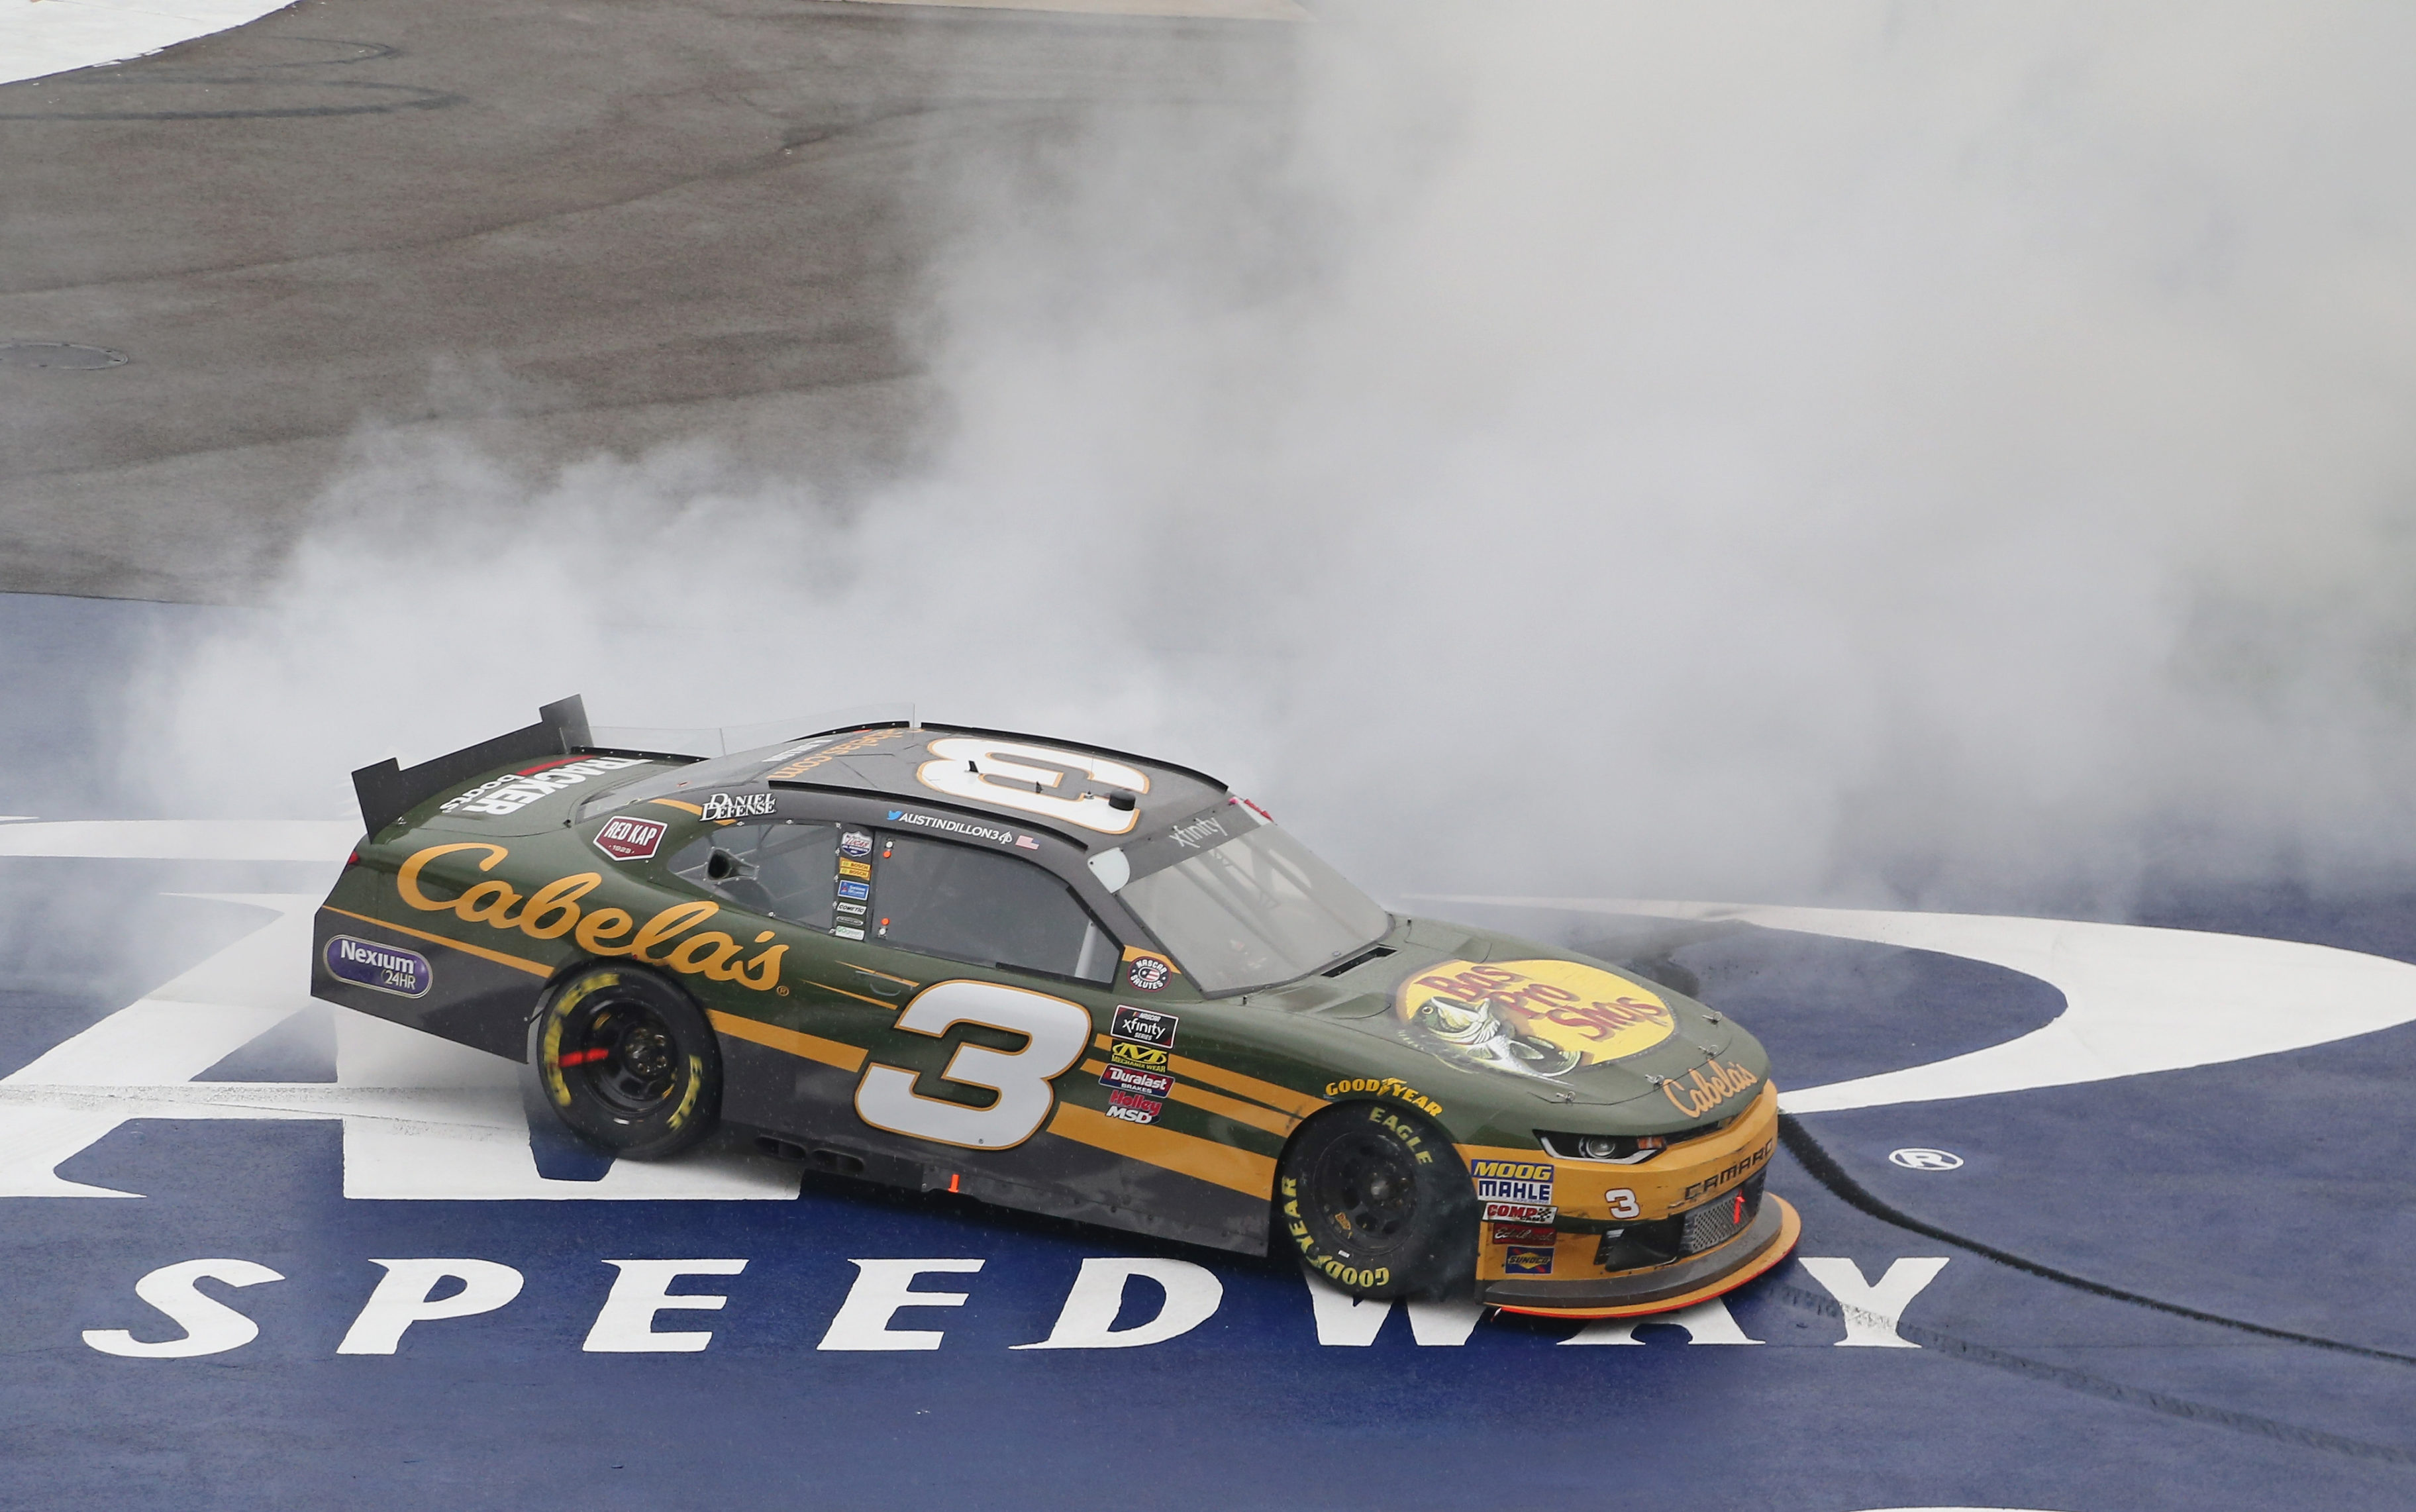 Austin Dillon wins at Michigan International Speedway